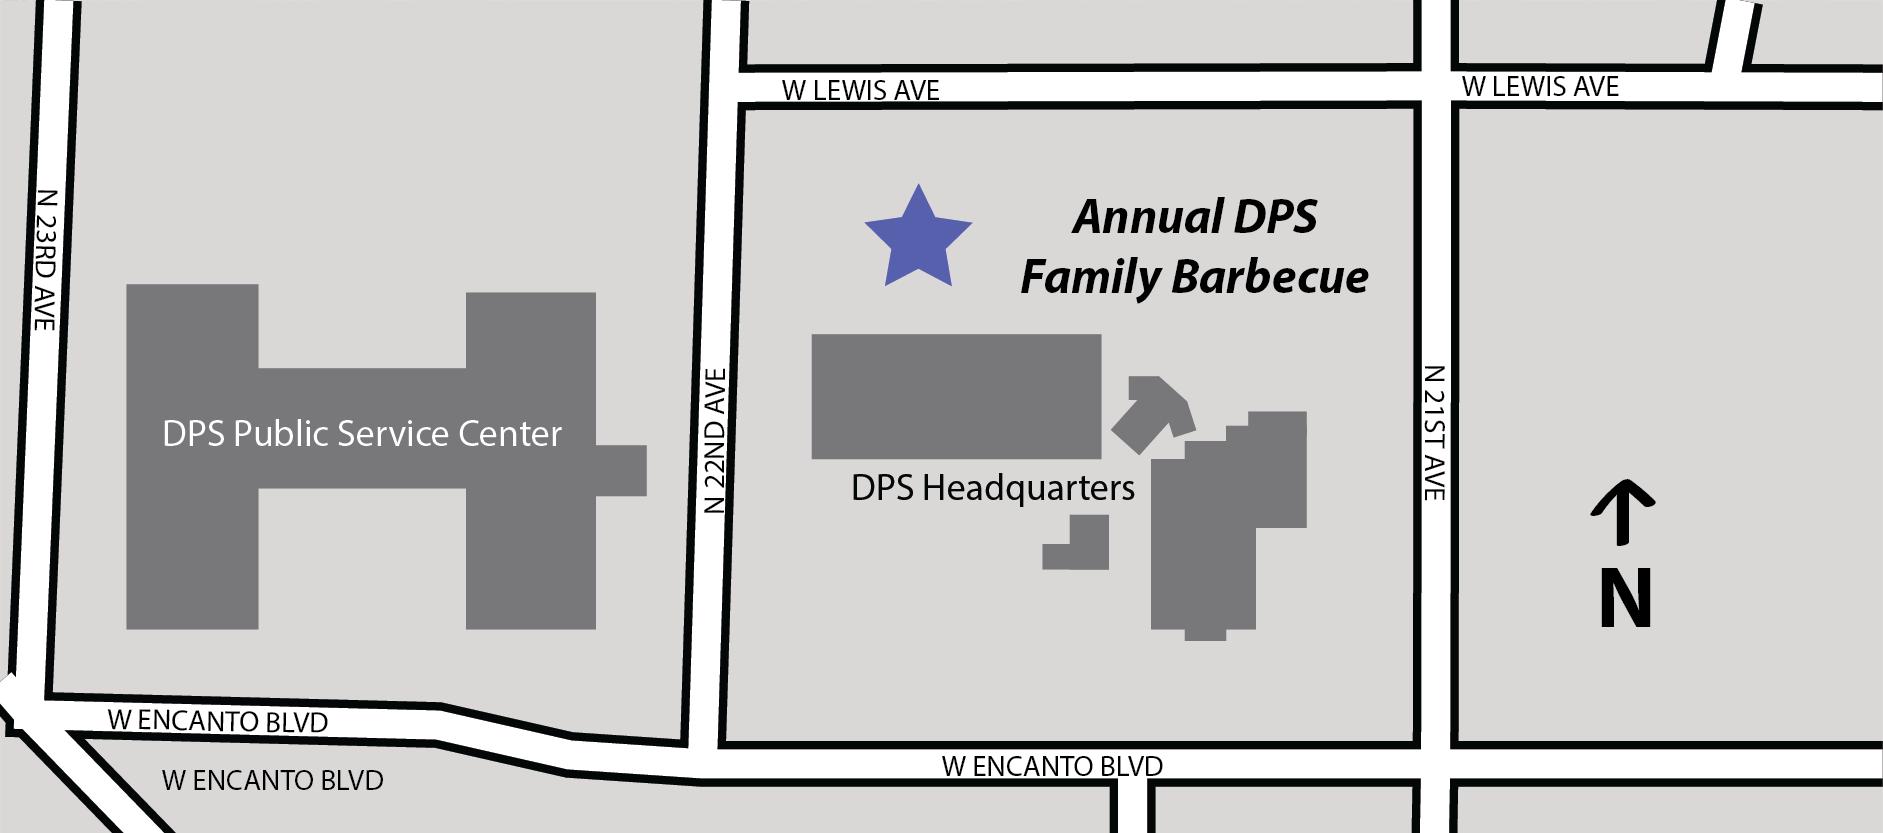 AnnualDPSFamilyBarbecue